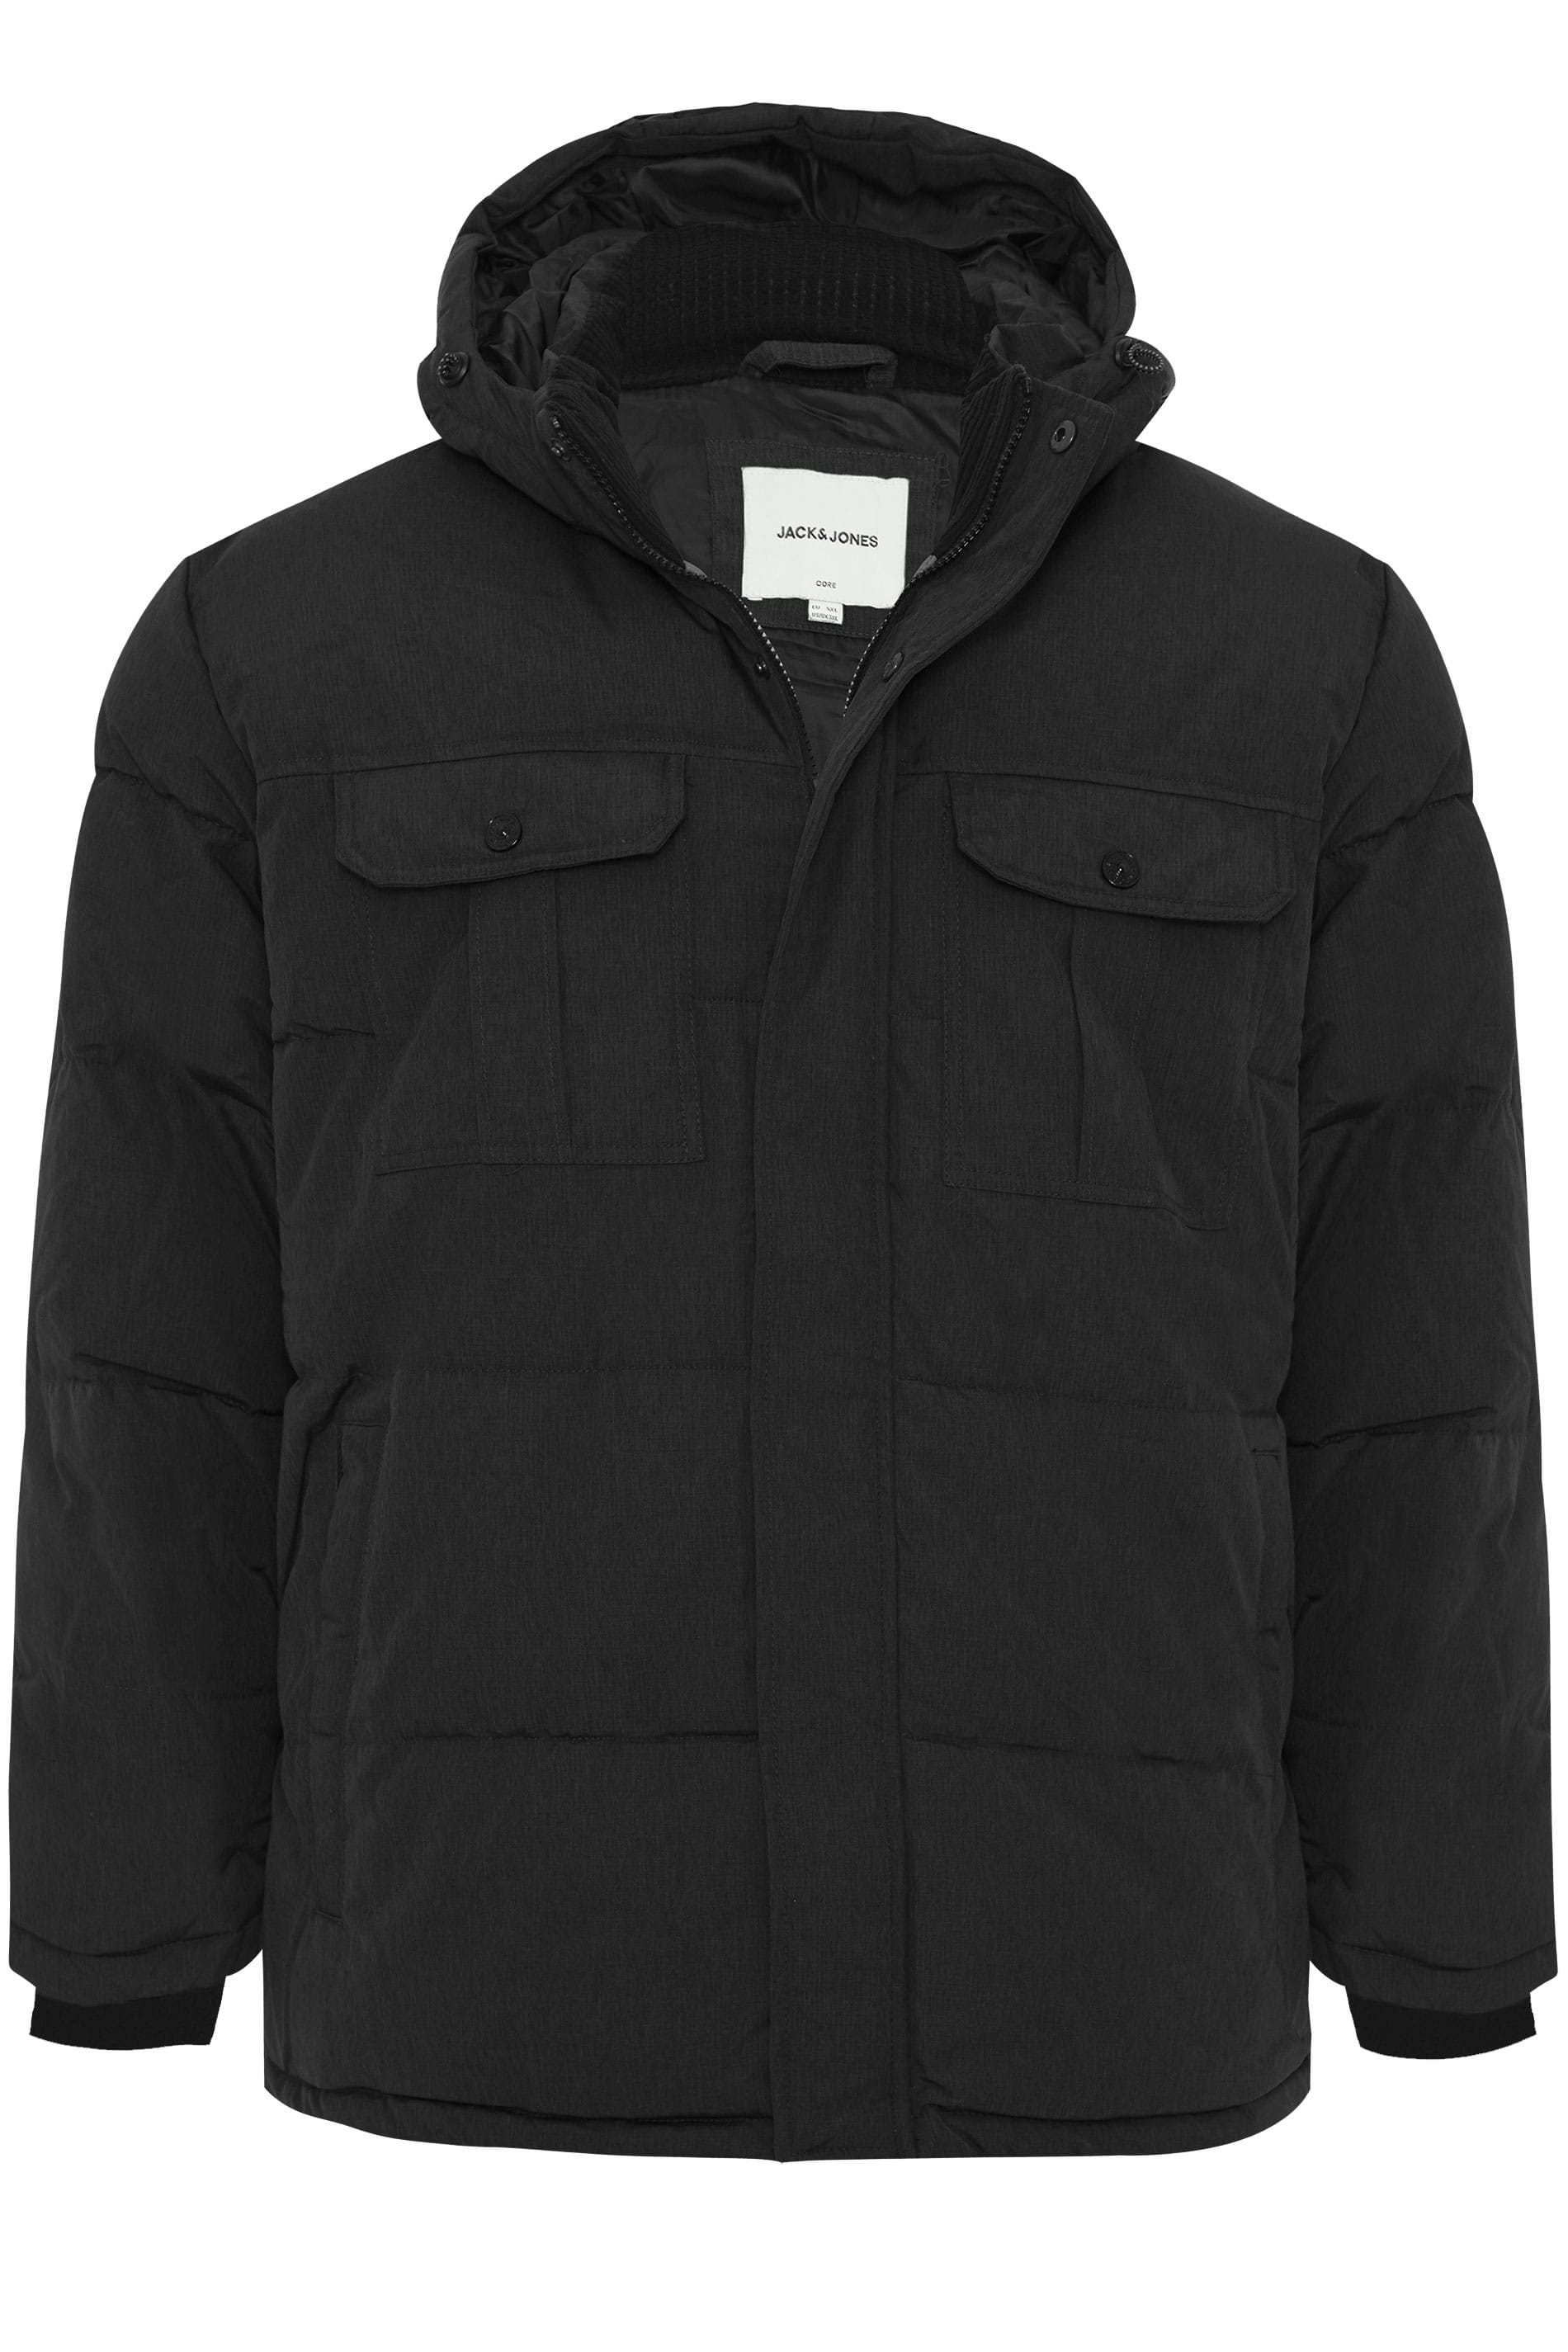 JACK & JONES Black Puffer Jacket